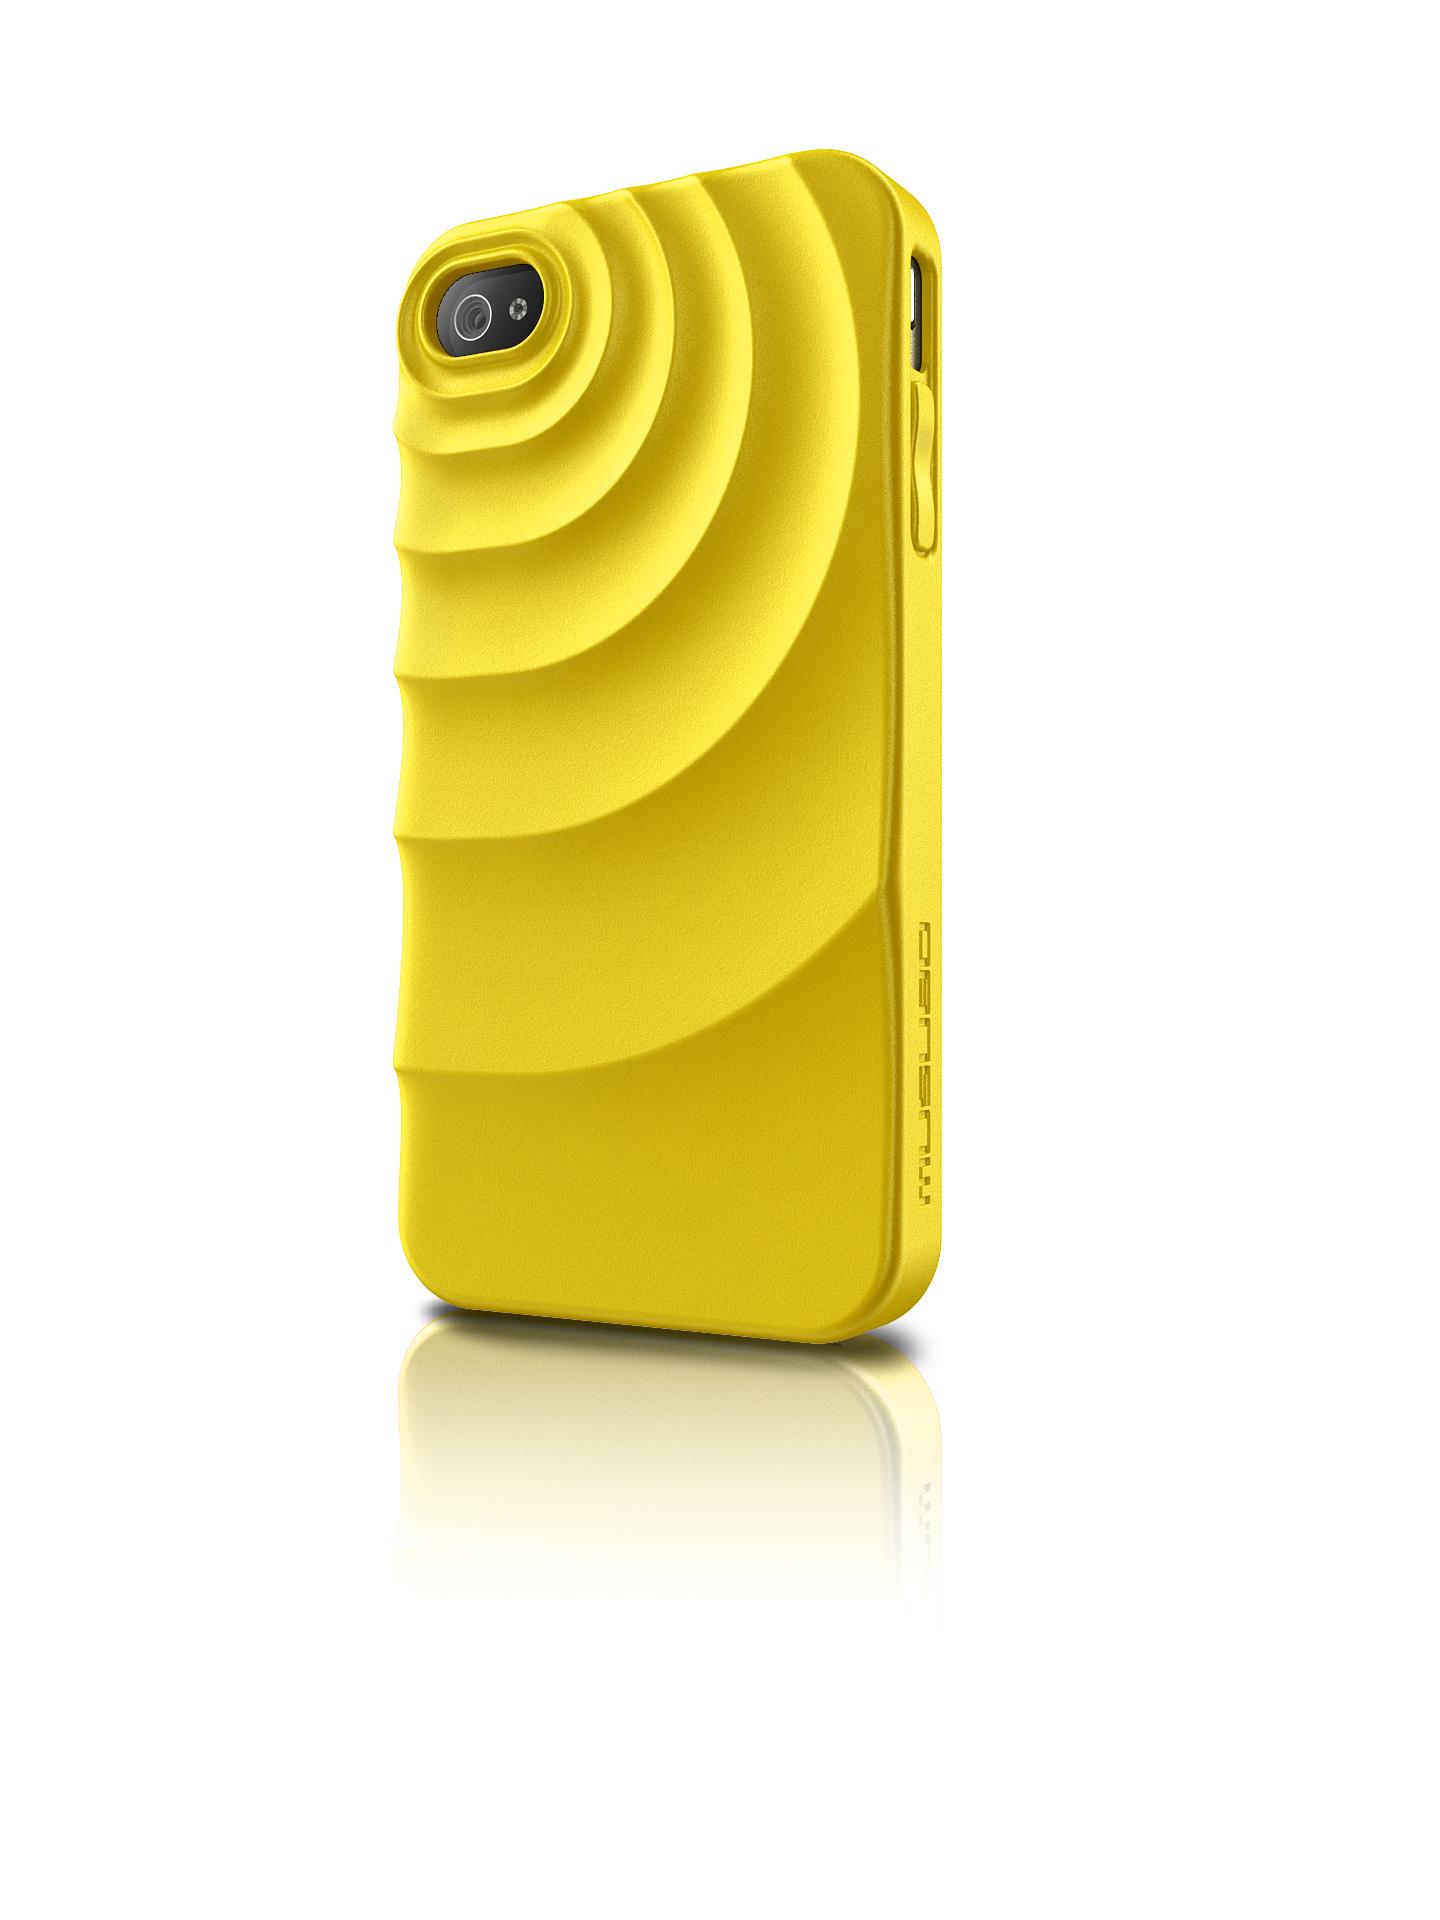 Original Musubo Case Ripple  Iphone 4S/4G Yellow Retail